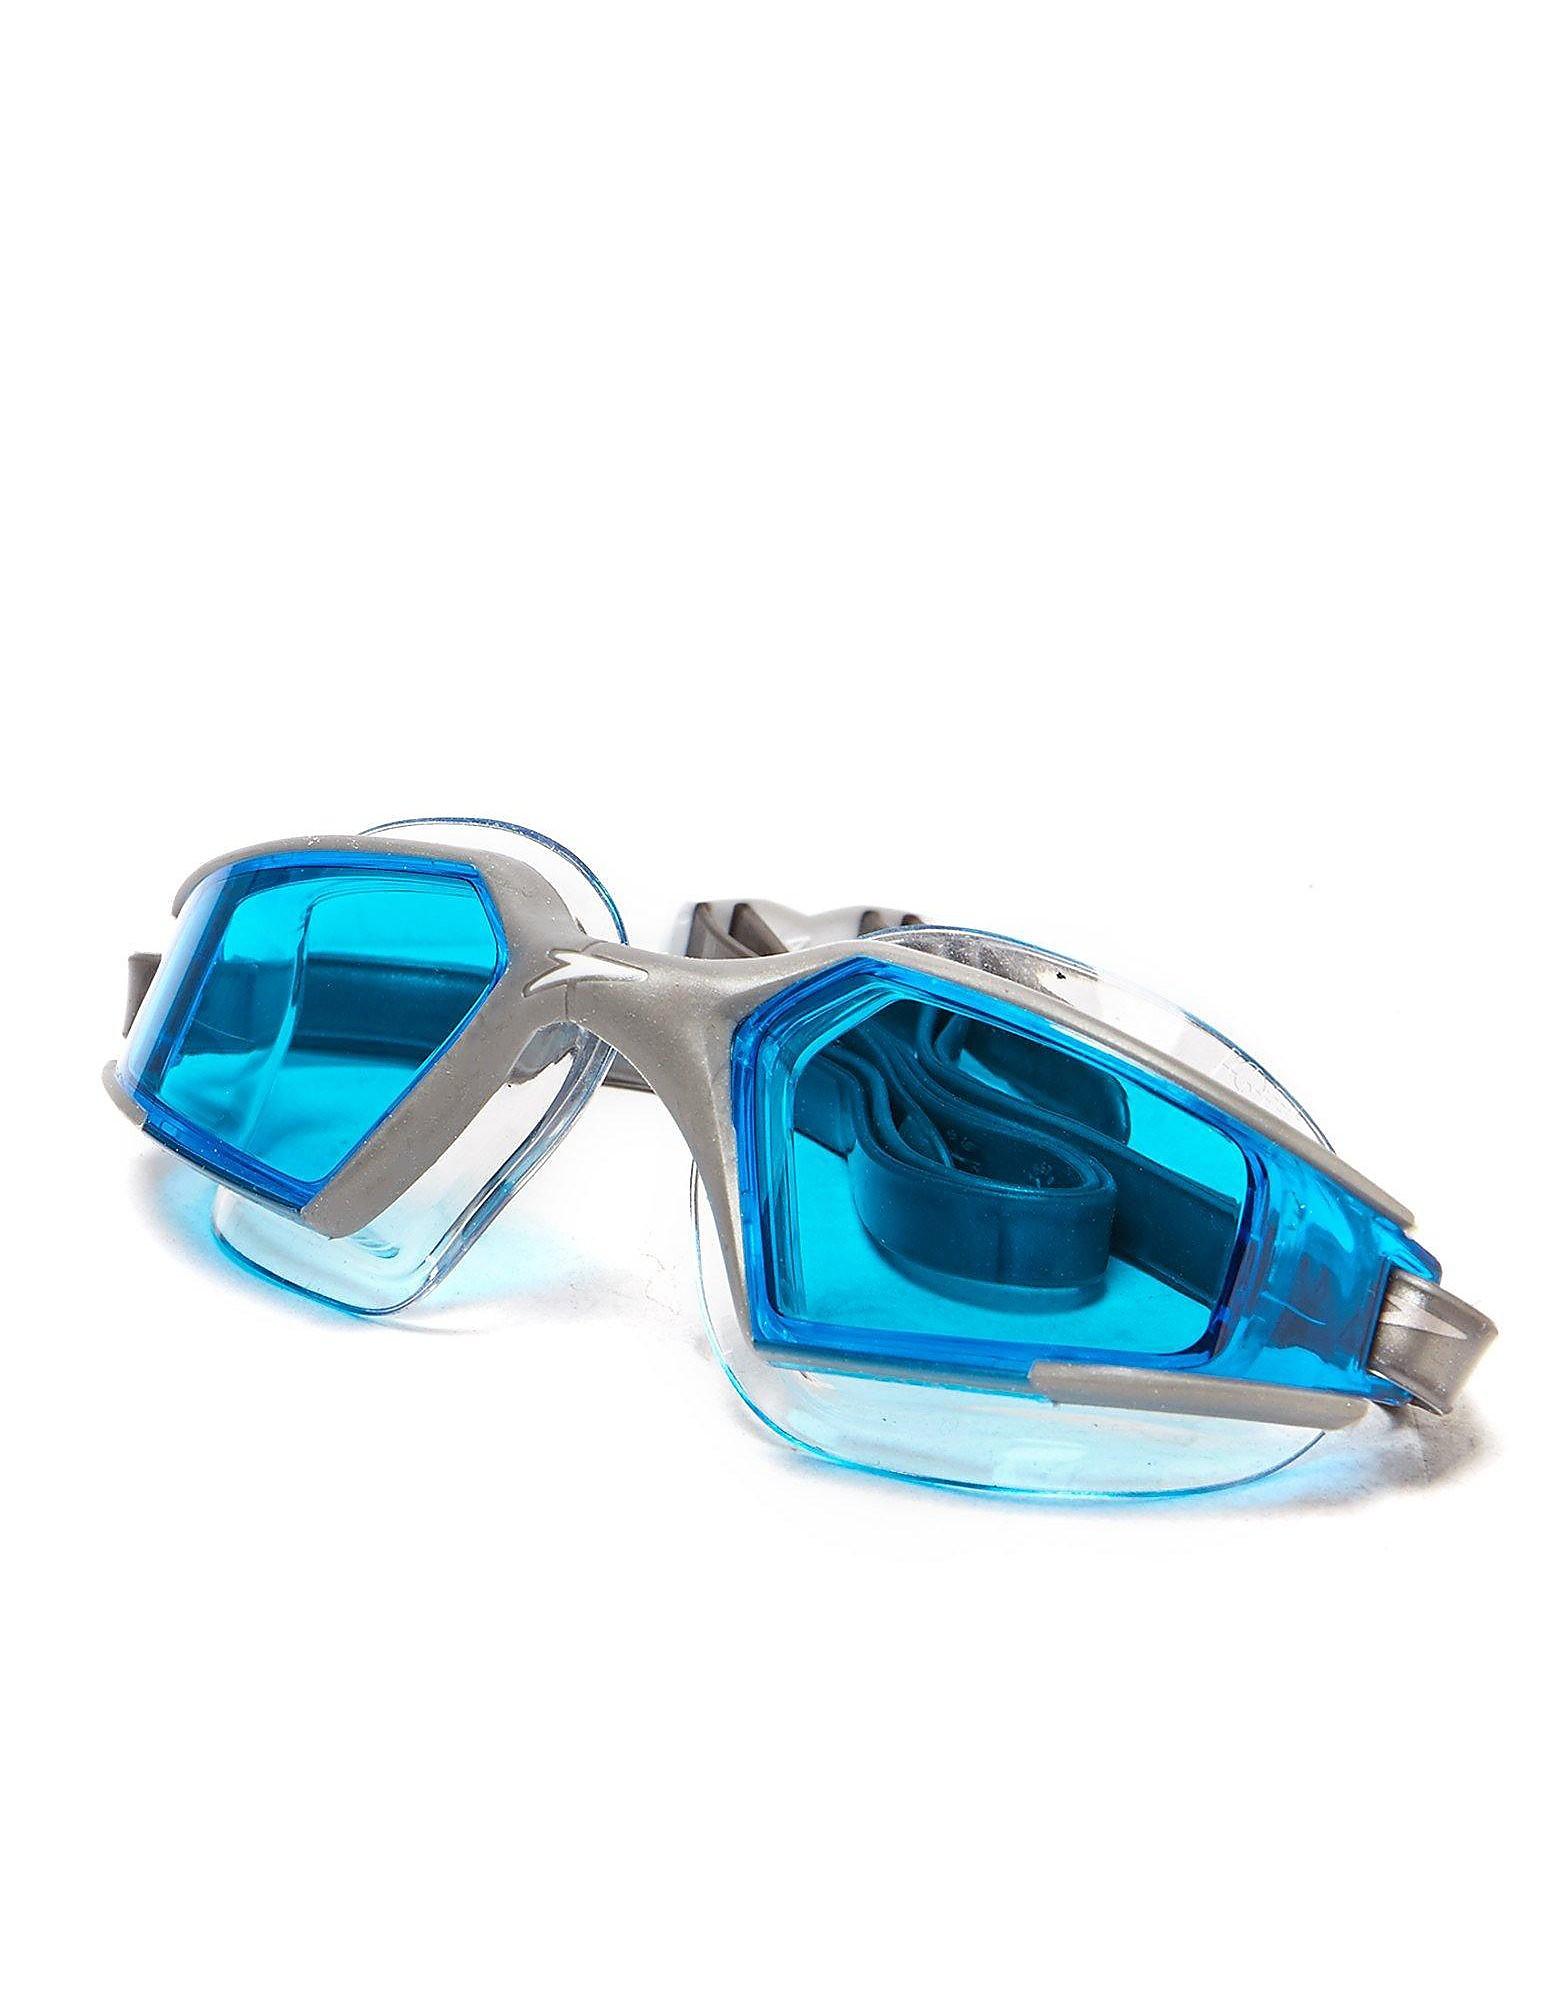 Speedo Aquapulse Max 2 Goggles